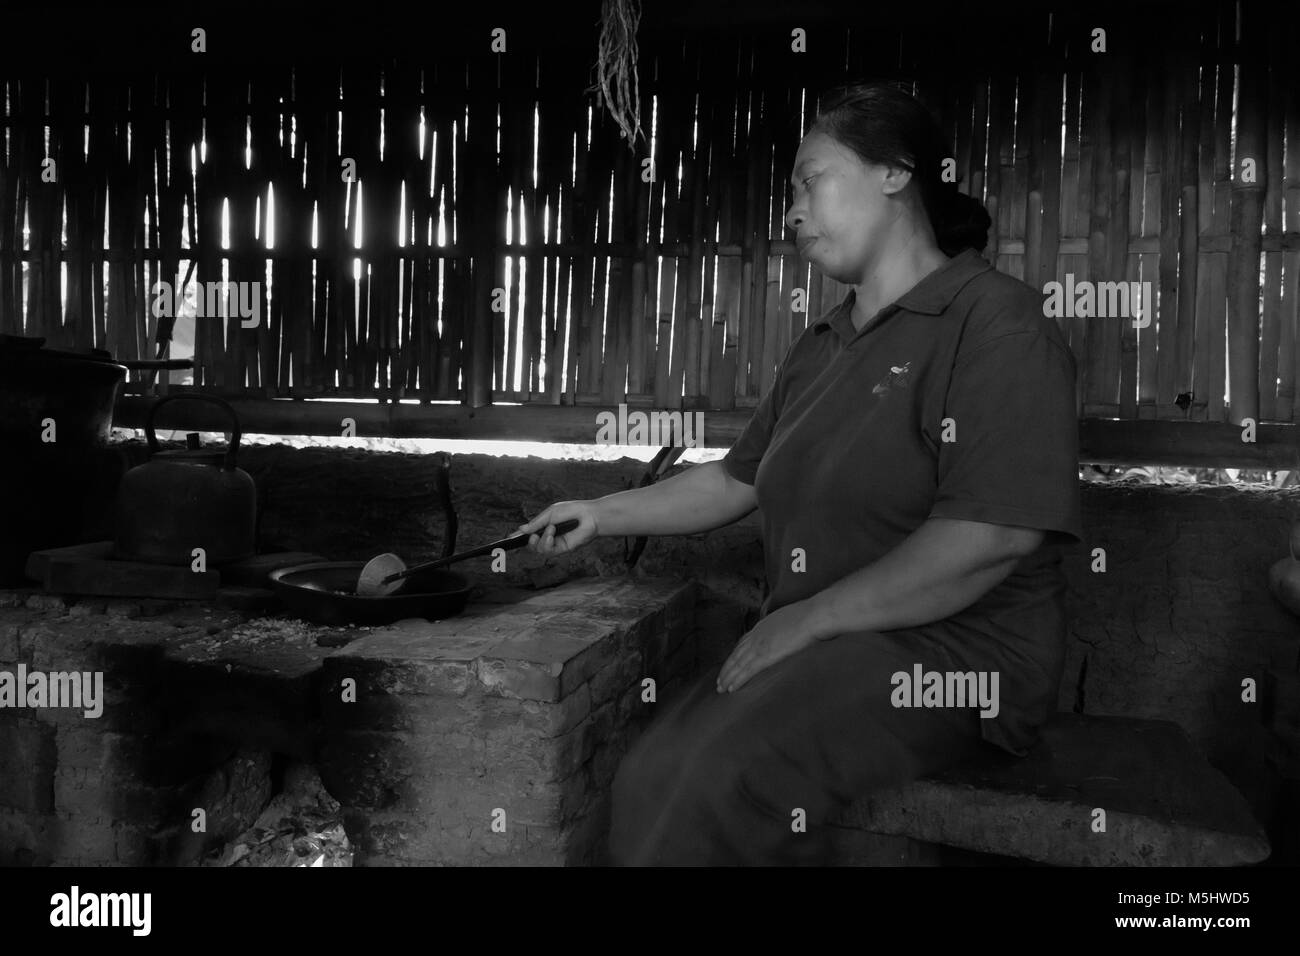 Woman roasting coffee, Tegallalang Rice Terraces, Ubud, Bali - Stock Image